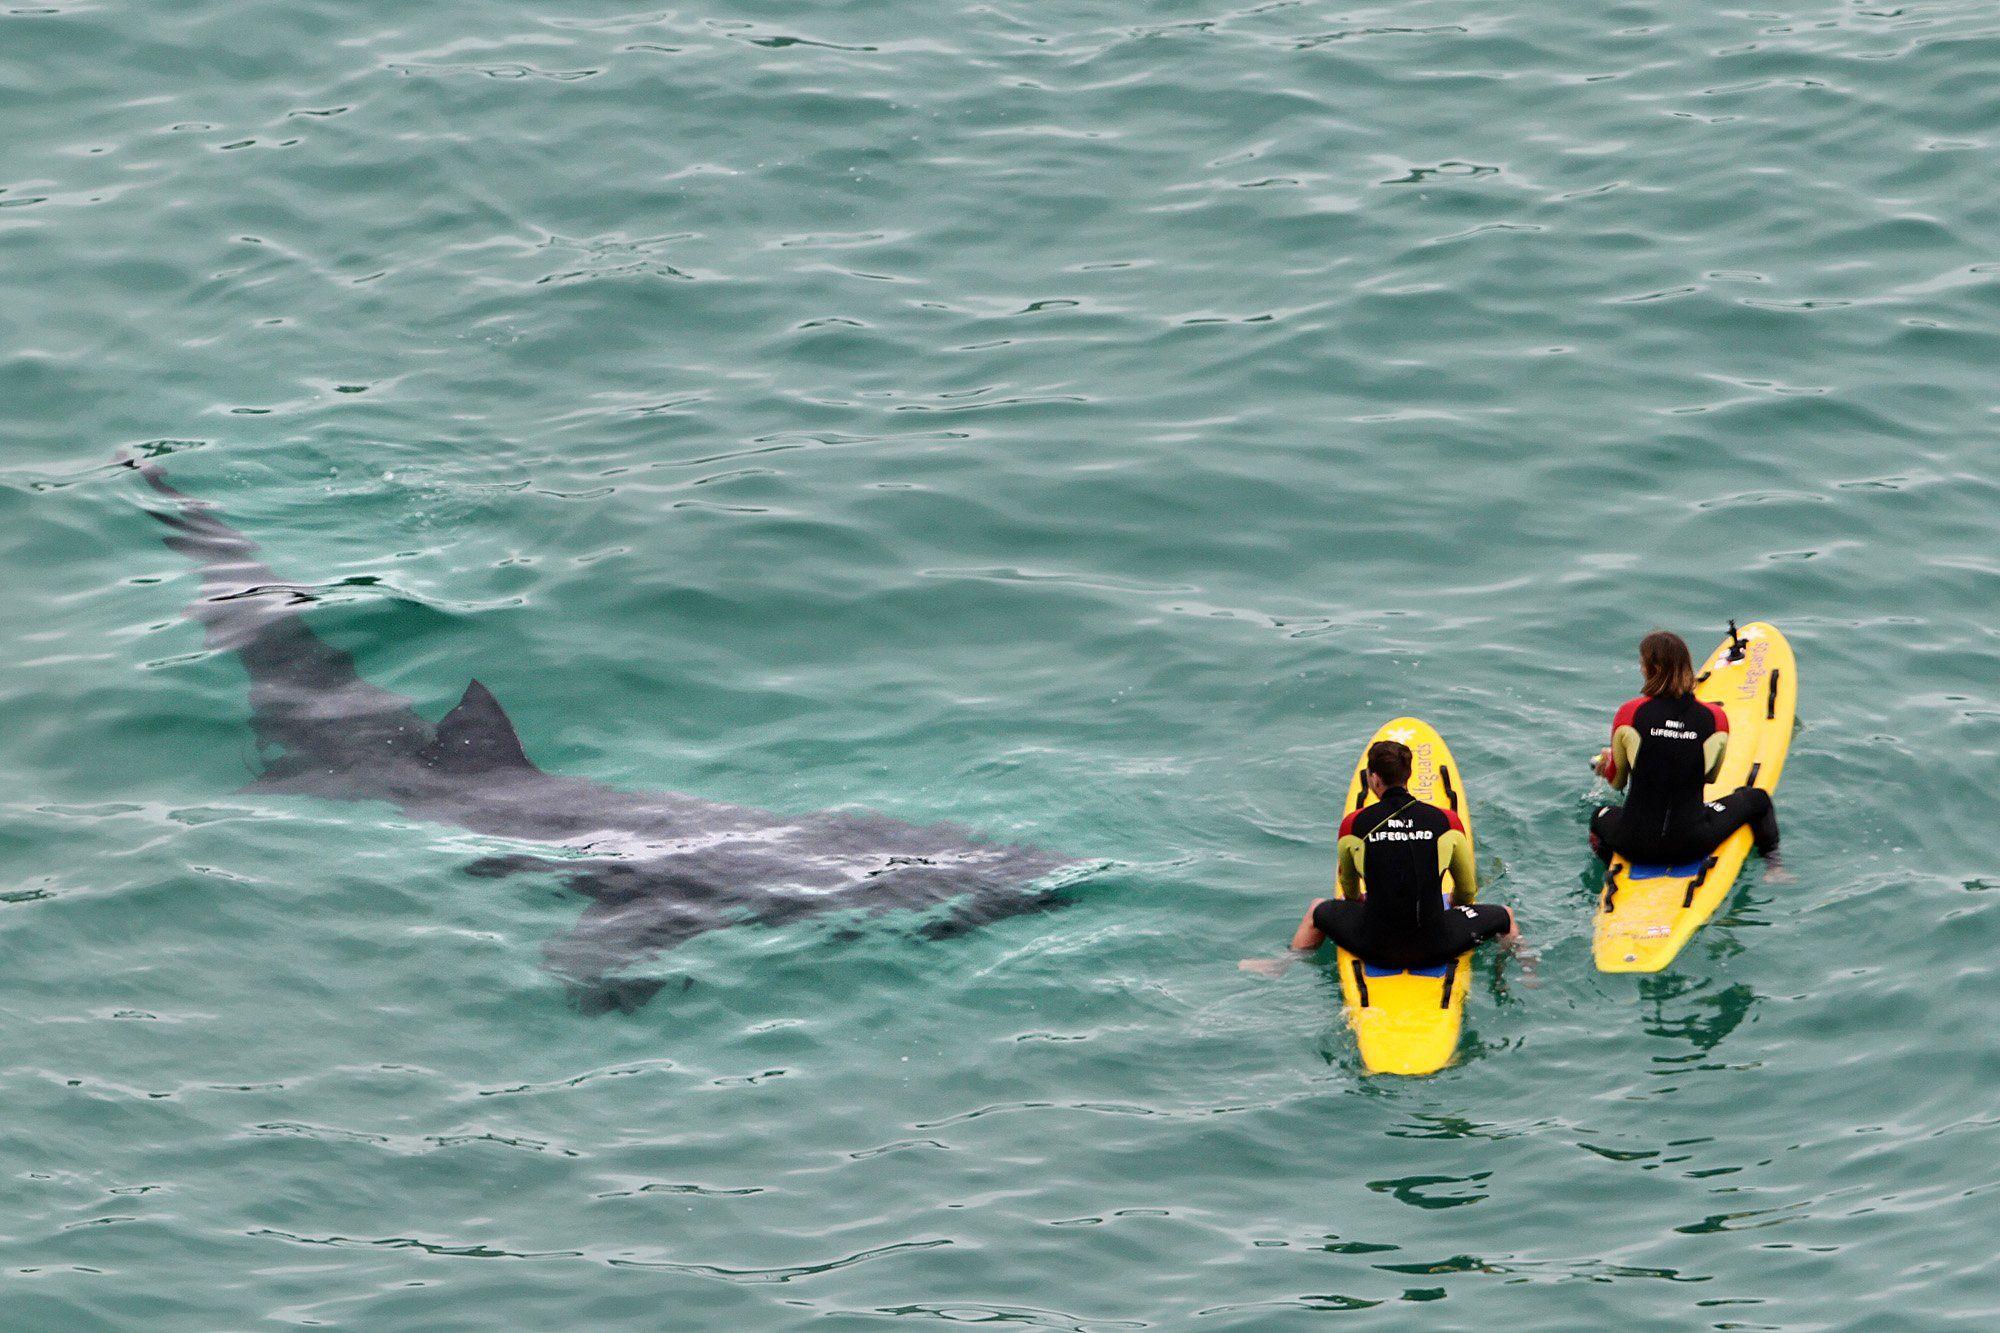 Un grupo de tiburones aterroriza a dos guardavidas surfistas